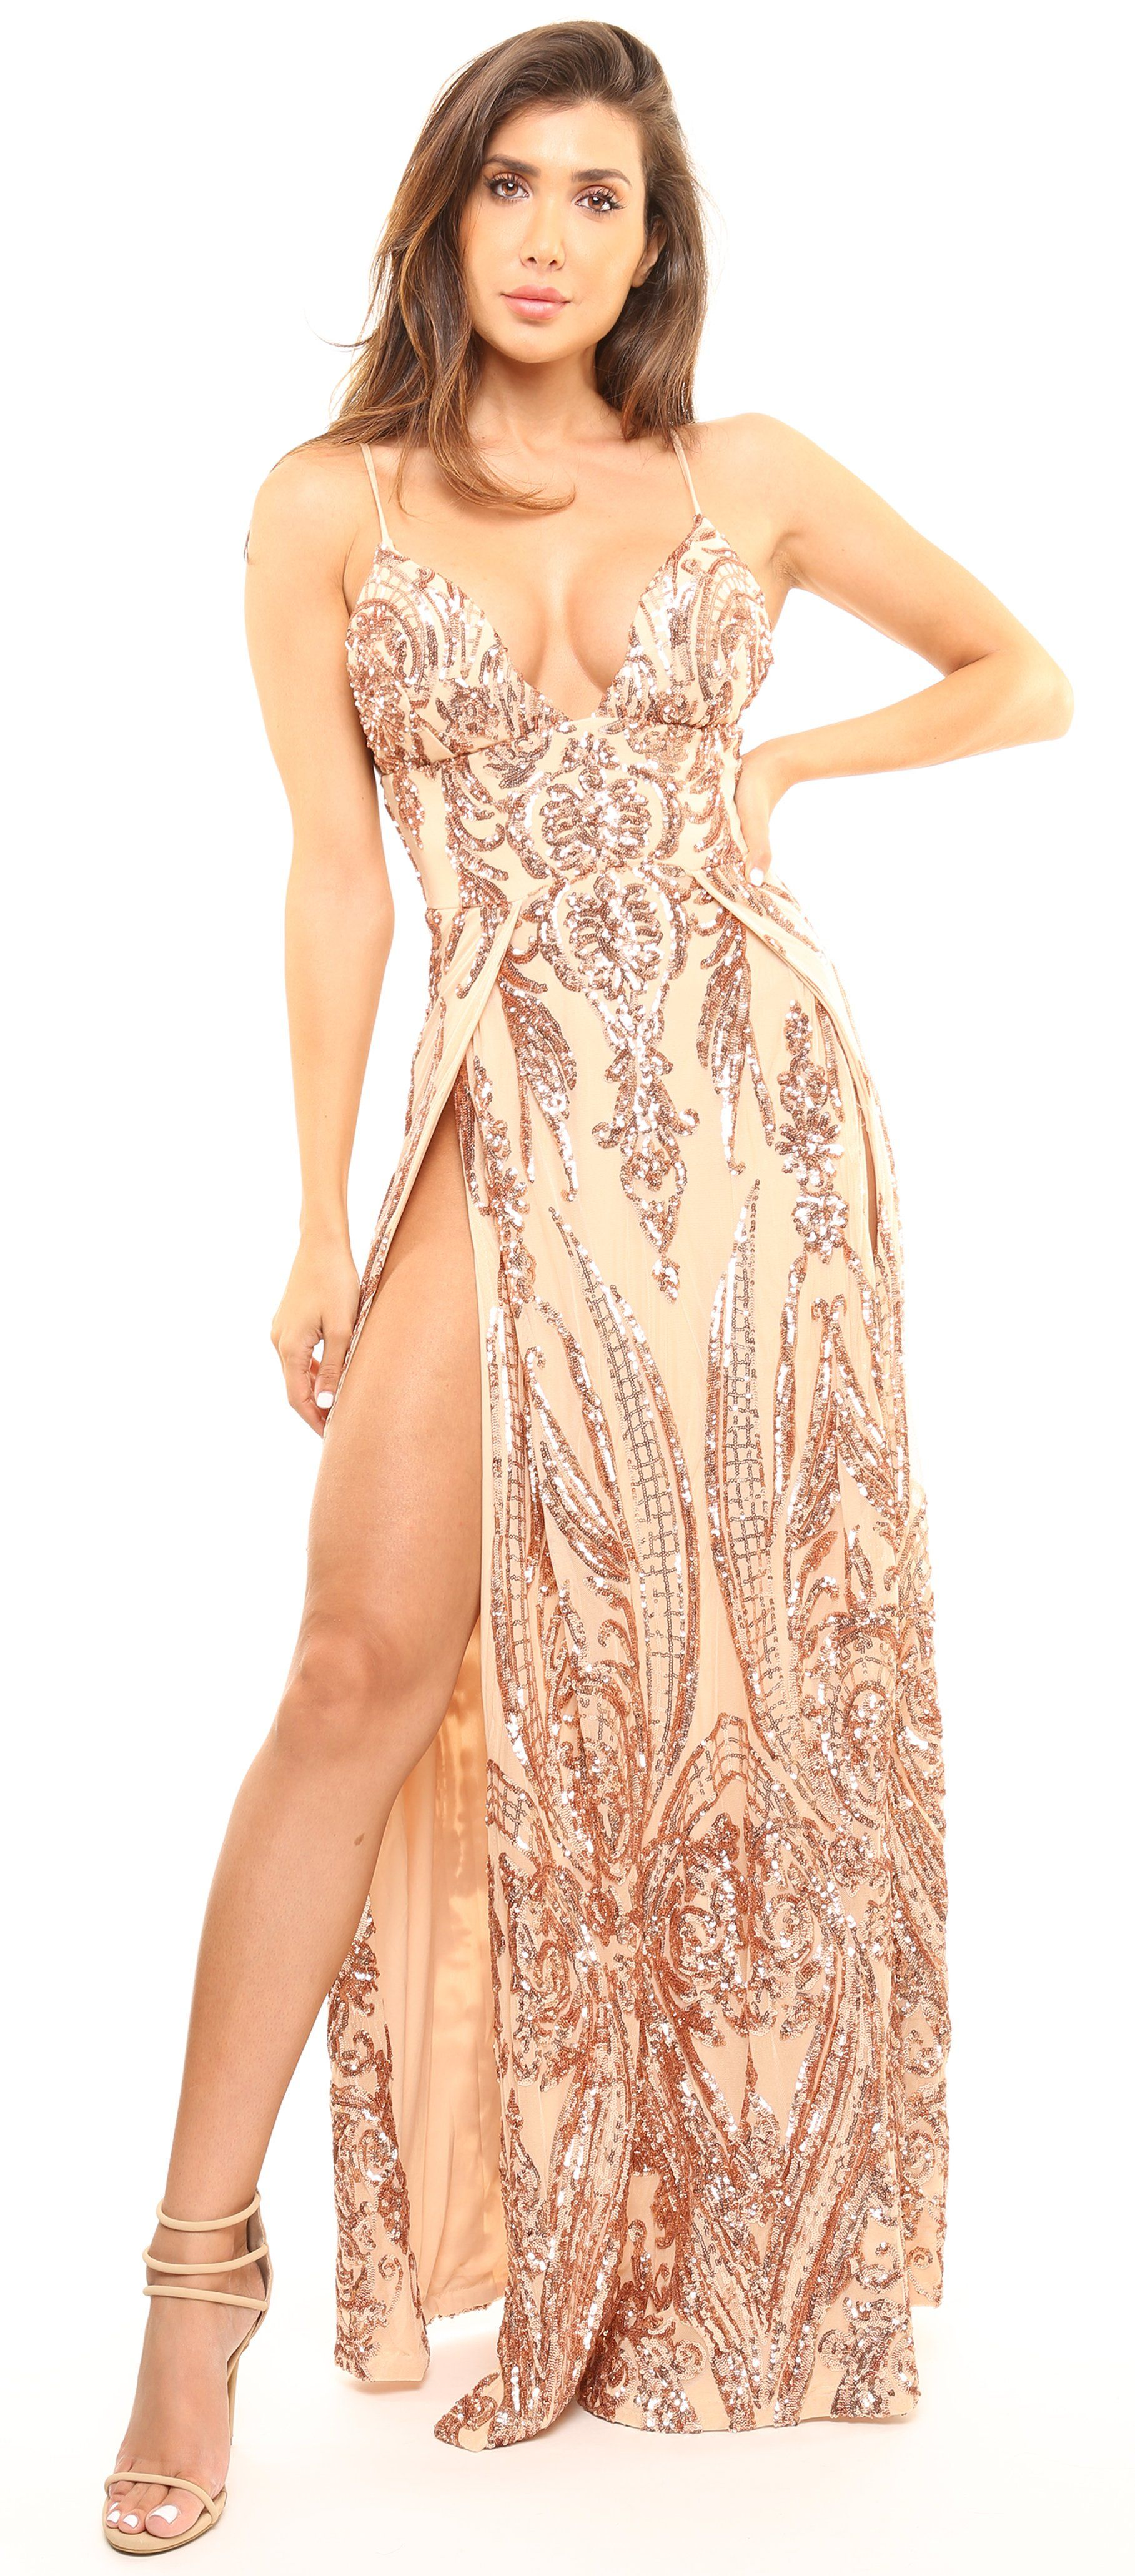 d57e34c7a4 Nouri Rose Gold Nude Double Slit Maxi Dress | Products | Maxi dress ...